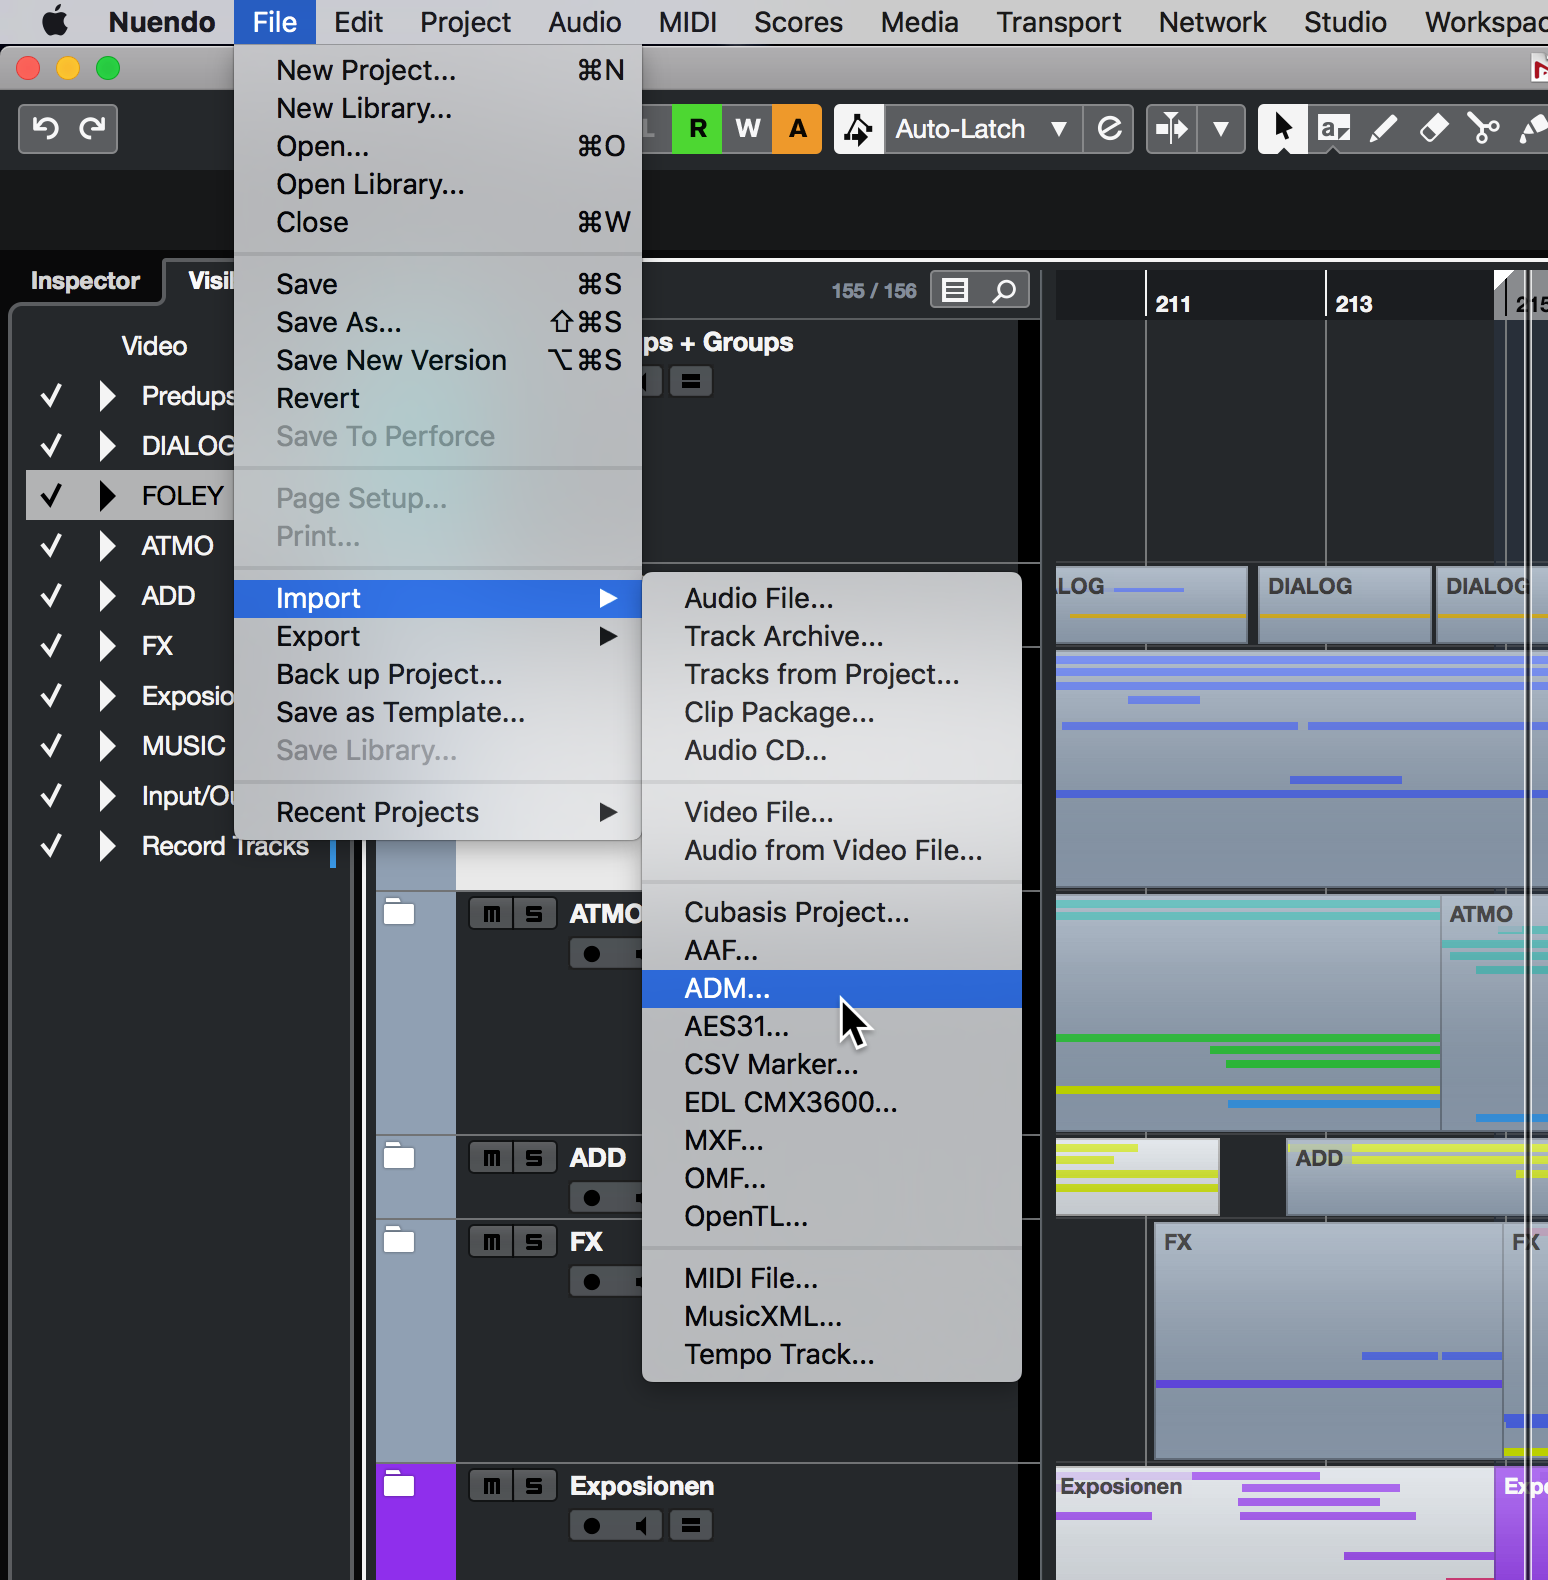 cubase studio 5 free download full version mac